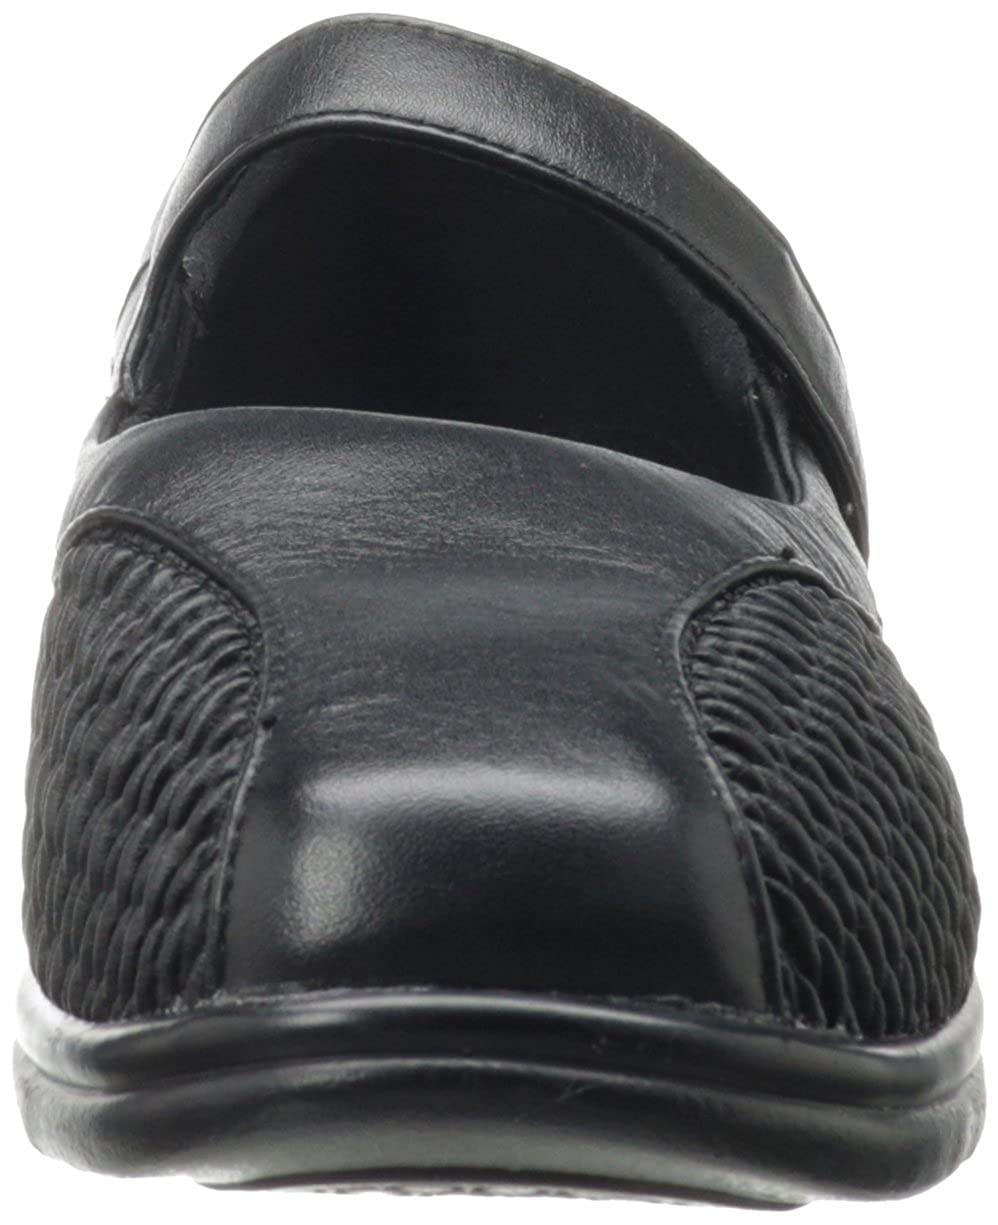 Amazon.com: Propet Women s Erika zapato: Shoes